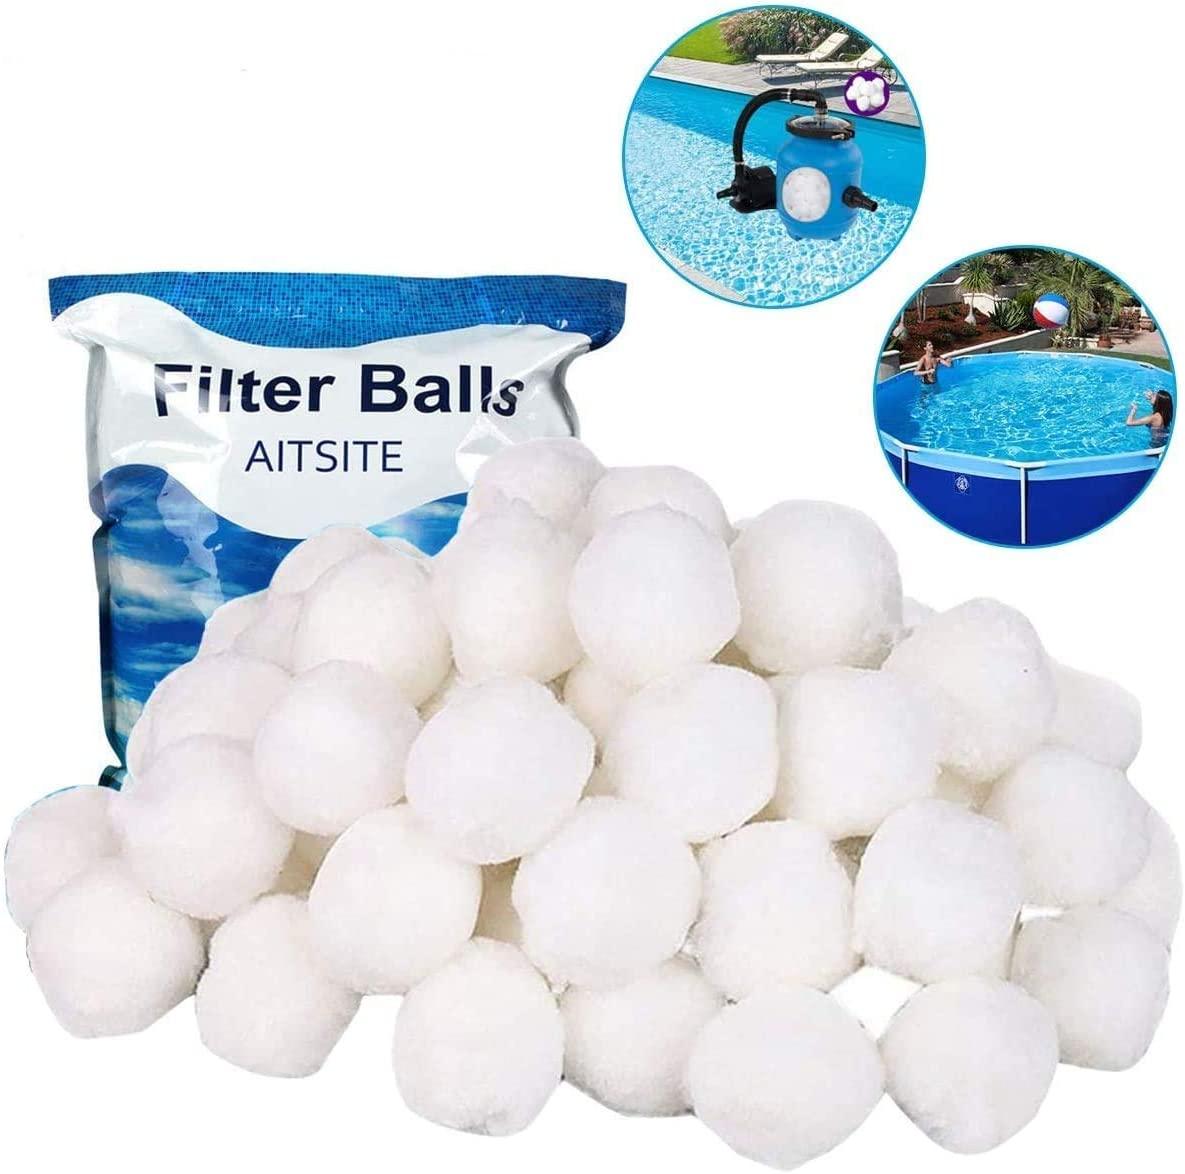 1300g Filter Balls Alternative for 46 kg Filter Sand